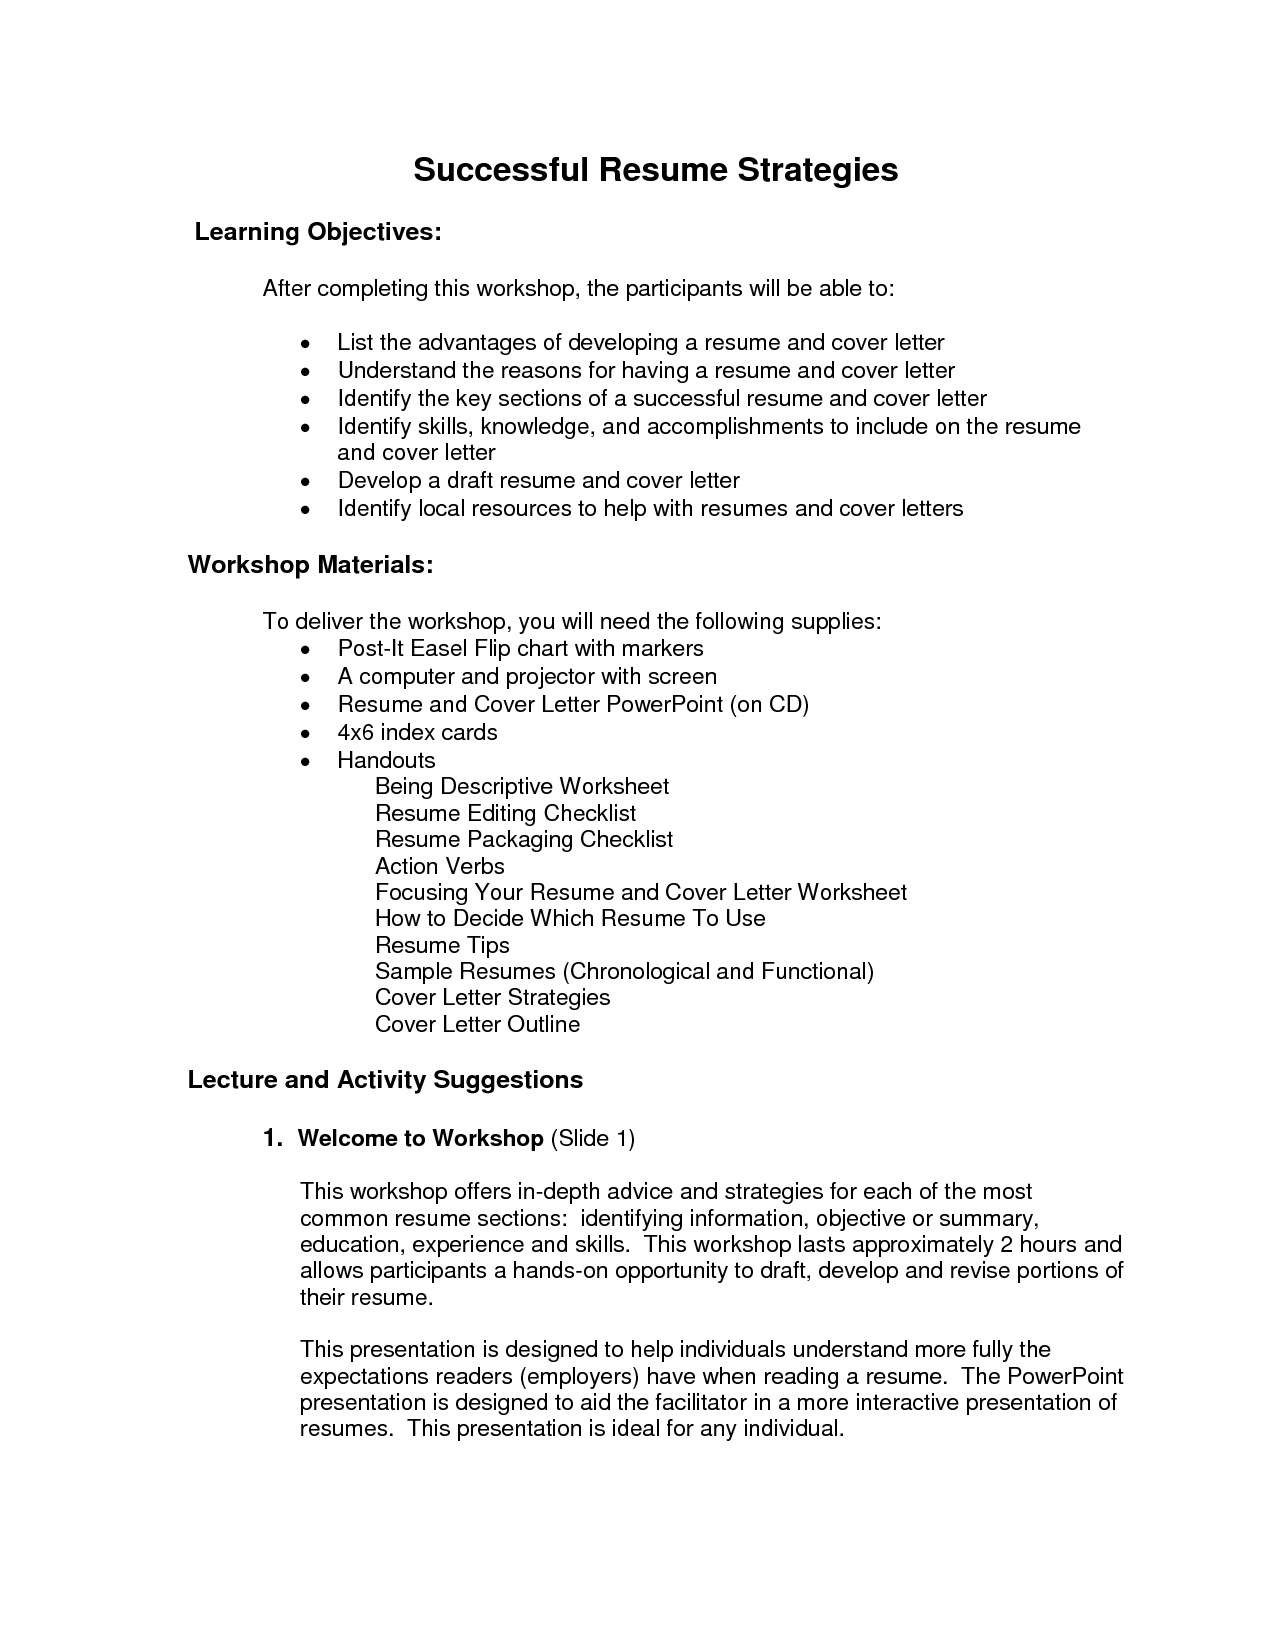 Clothing Stylist Resume Samplescareer Resume Template Career Resume Template Resume Objective Examples Resume Objective Statement Examples Resume Examples